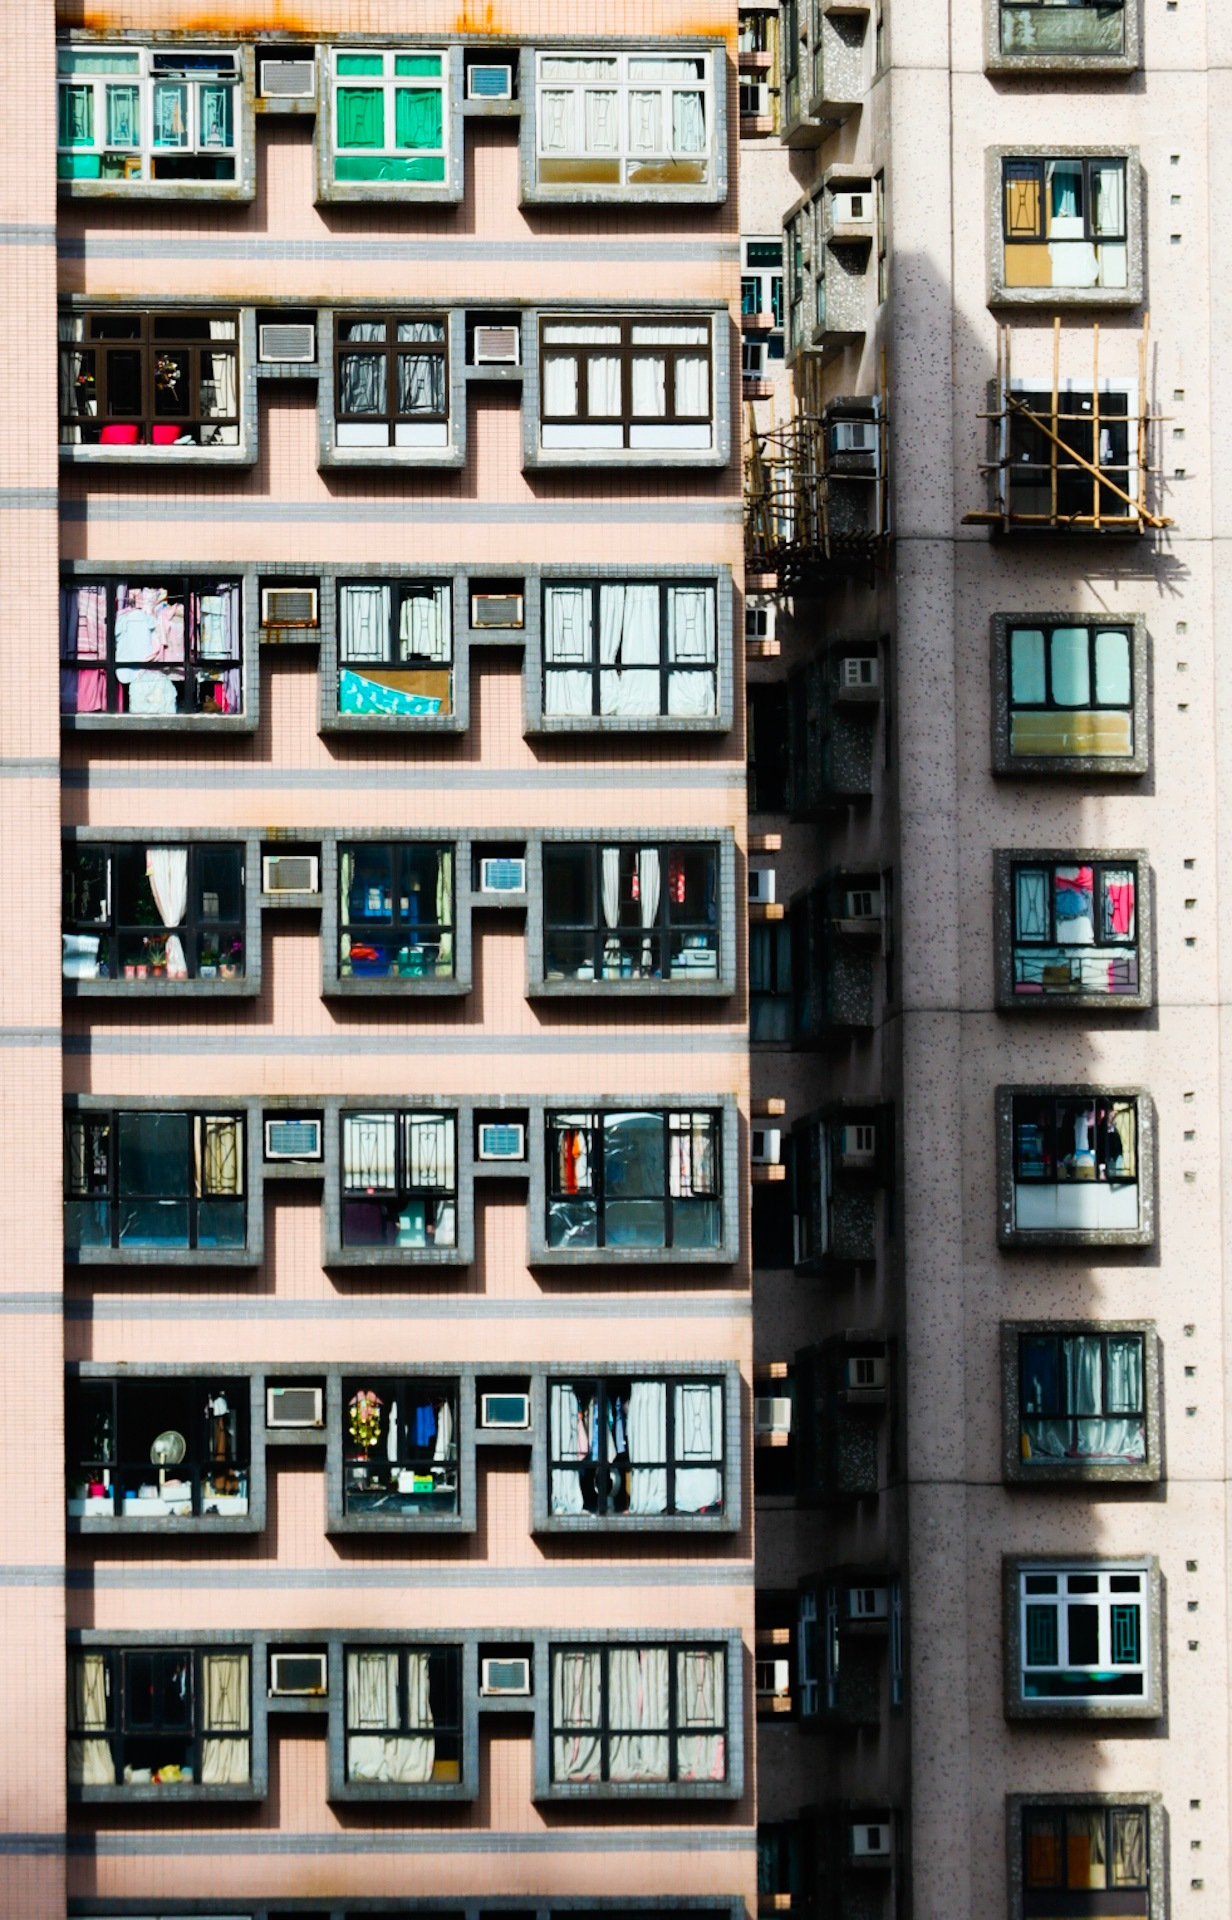 Untitled by Carlo Raineri